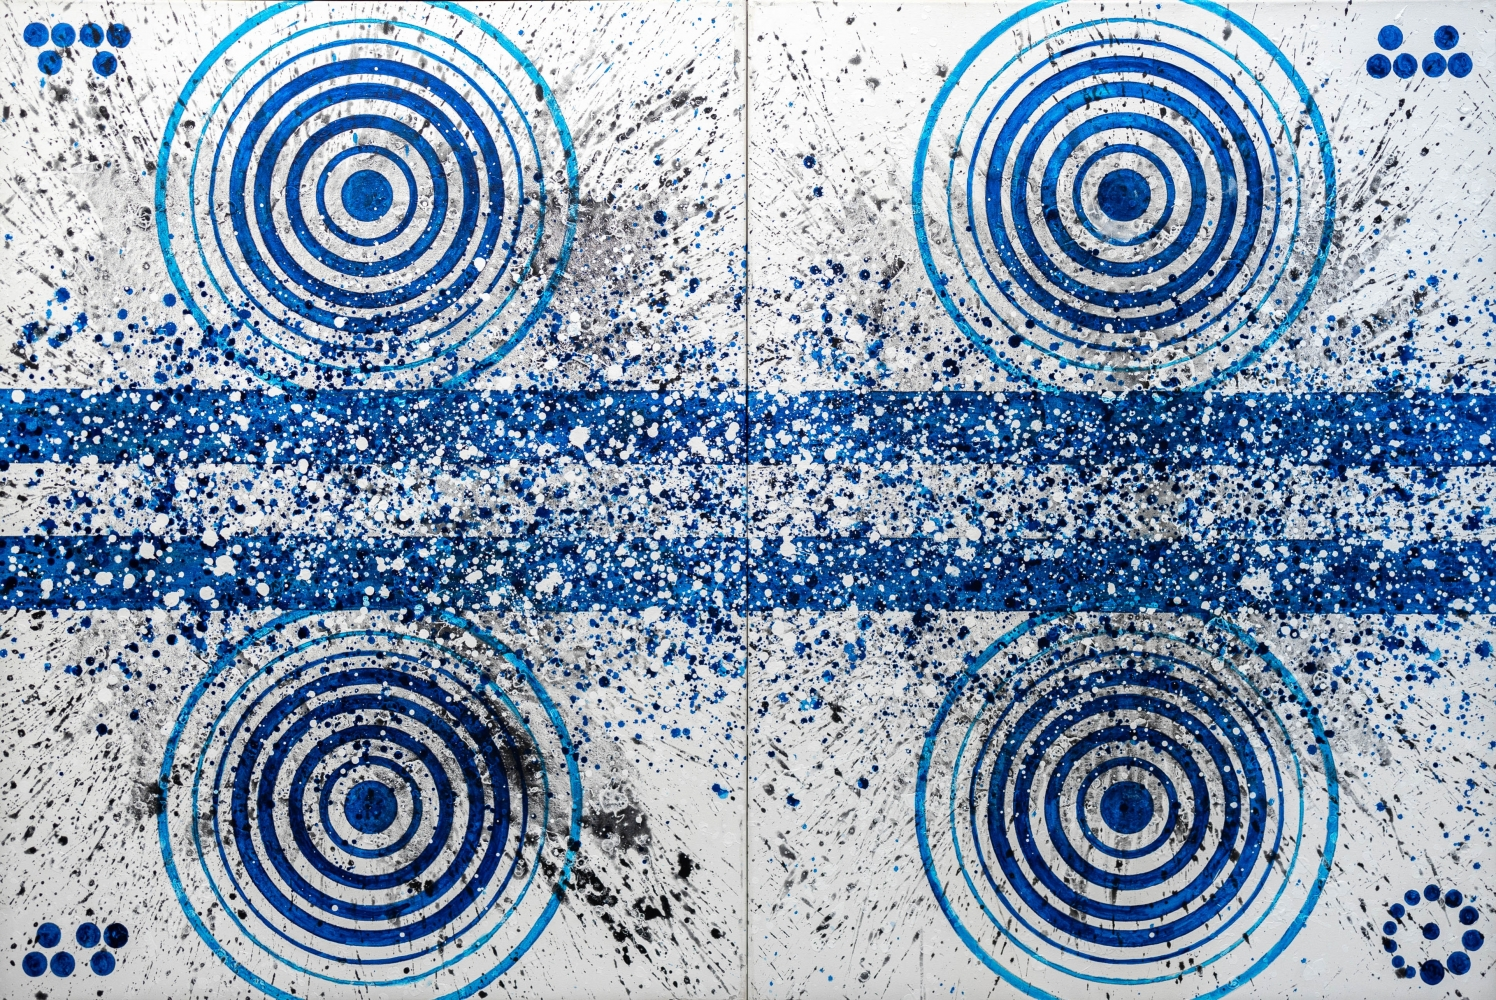 J. Steven Manolis, Hamptons 27, 2016, Acrylic painting on canvas, 72 x 48 inches, Hamptons Art